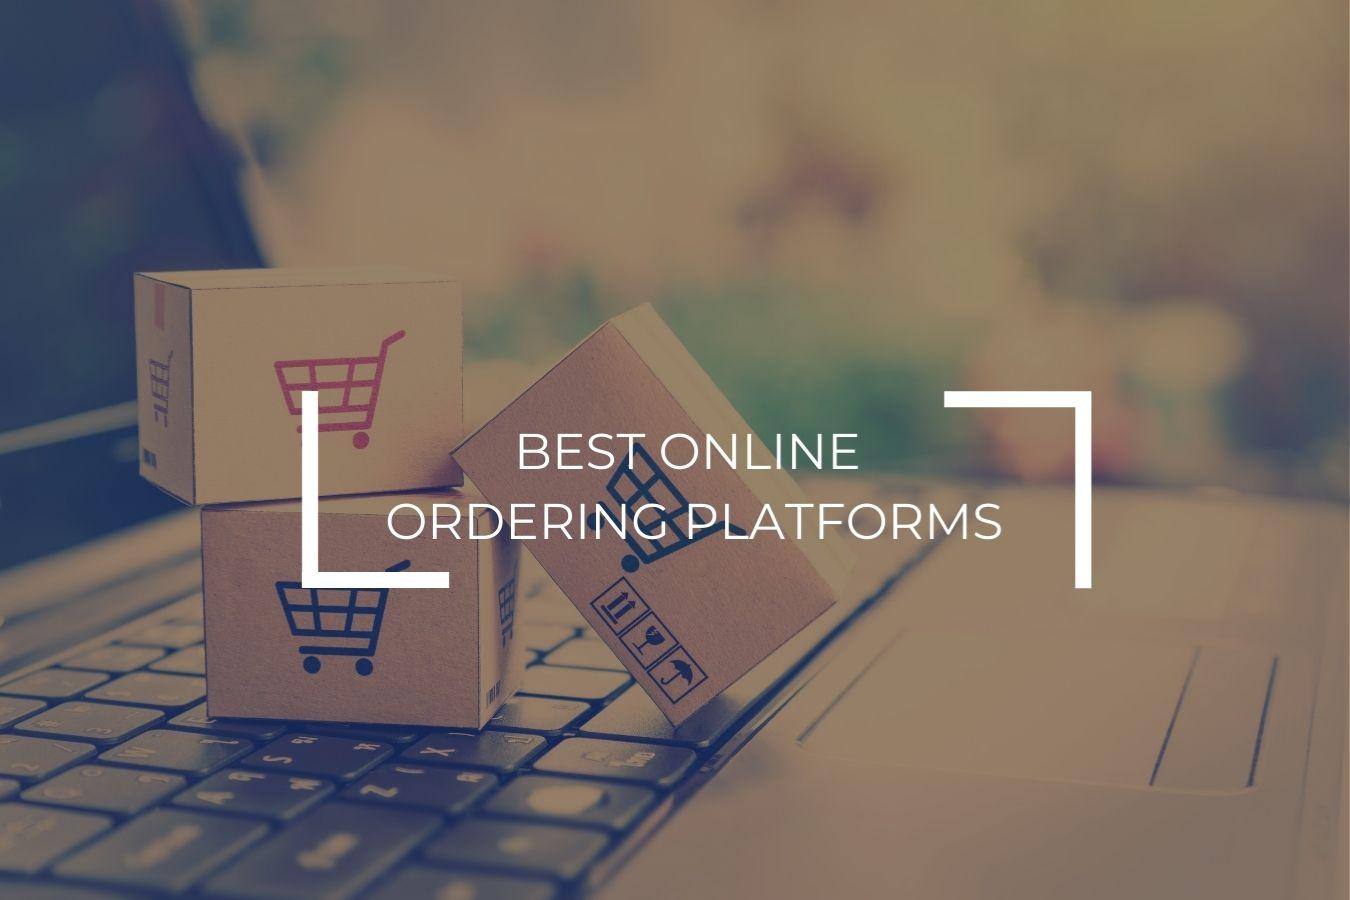 Best online ordering platforms